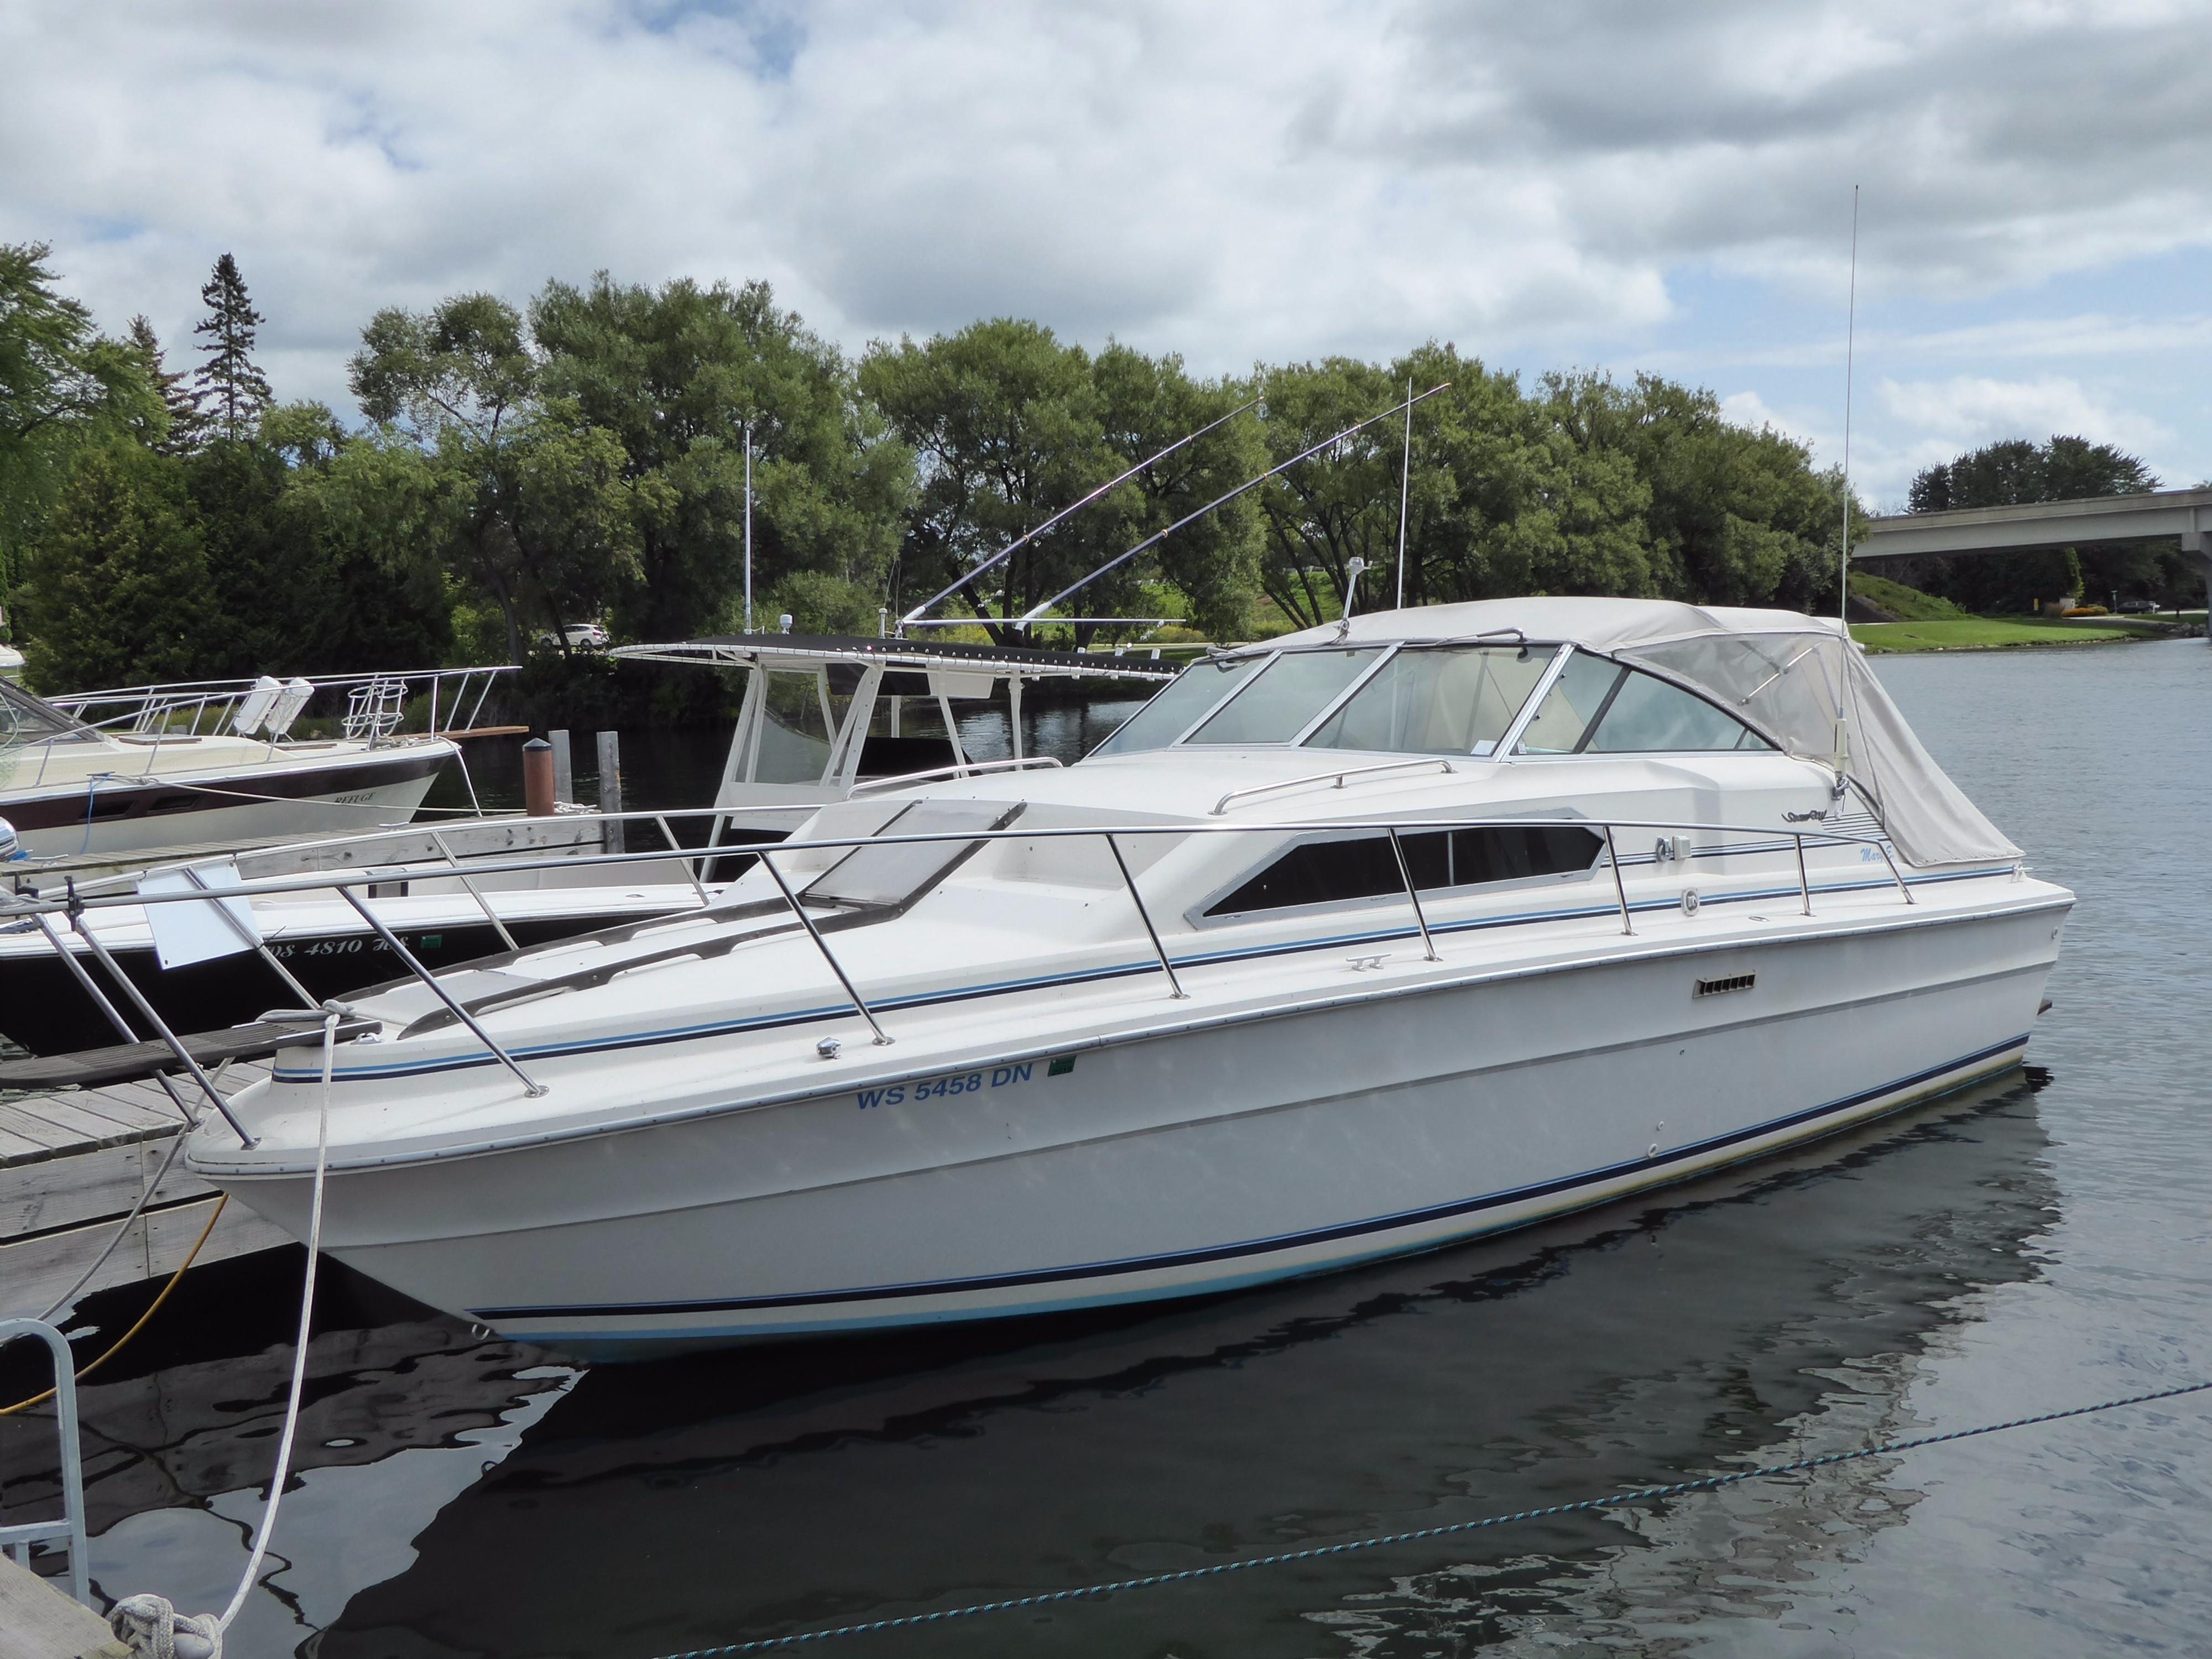 1978 Sea Ray 300 Weekender Power Boat For Sale Wwwyachtworldcom